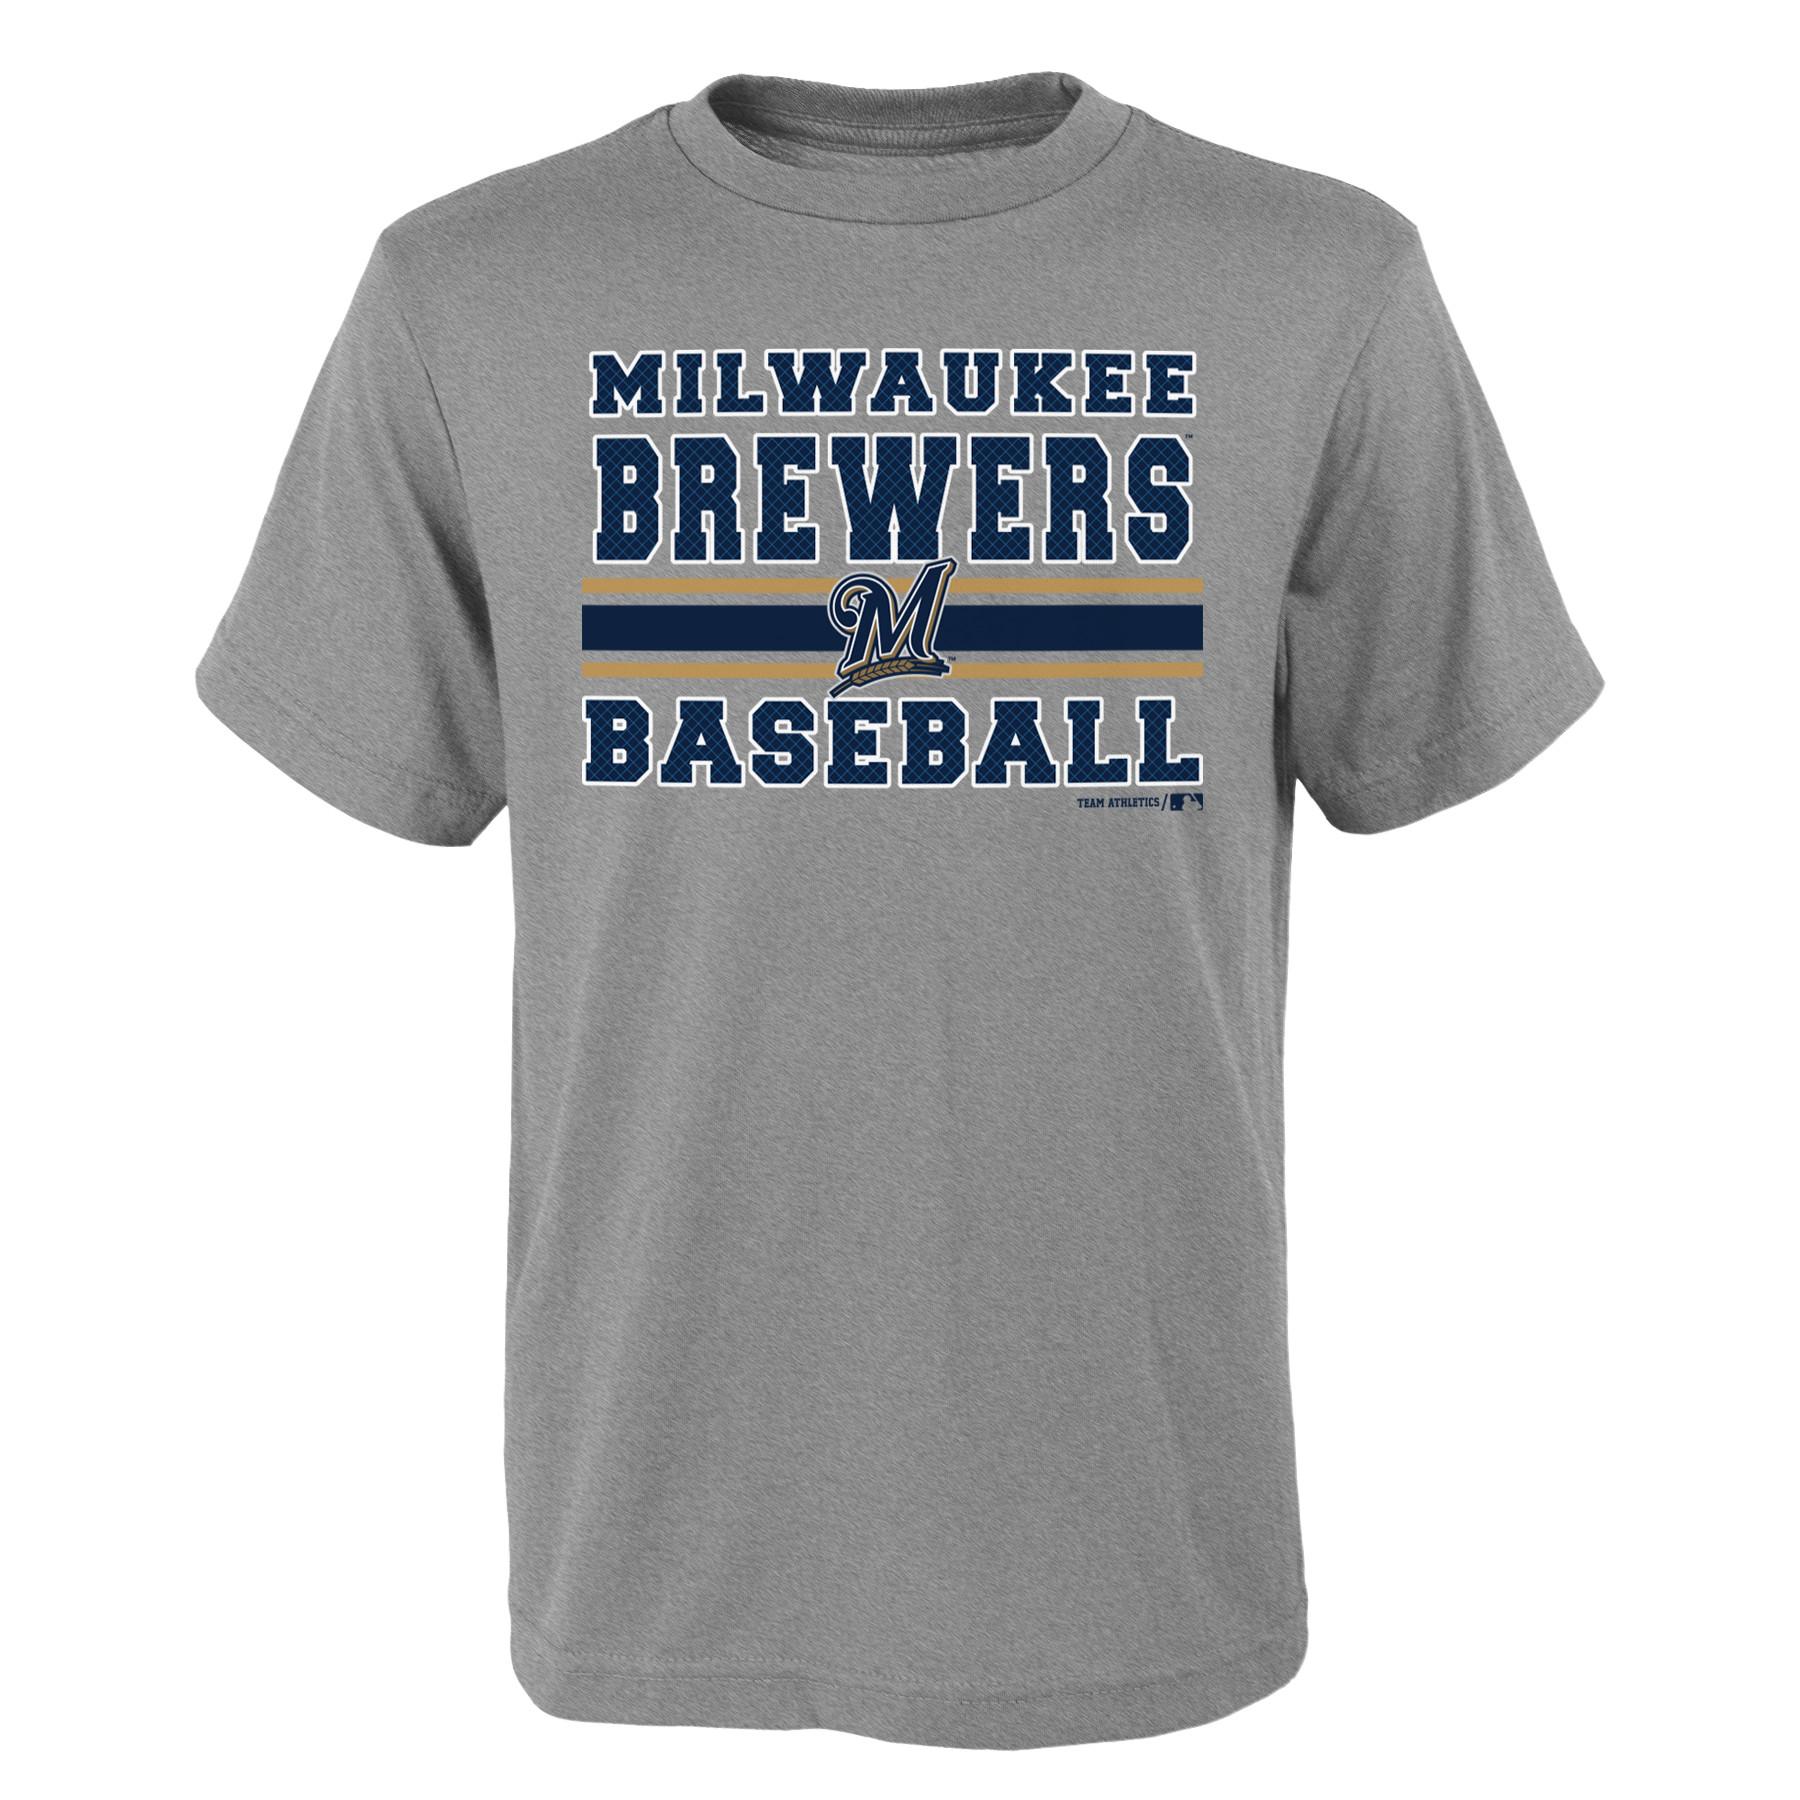 MLB Milwaukee BREWERS TEE Short Sleeve Boys OPP 90% Cotton 10% Polyester Gray Team Tee 4-18